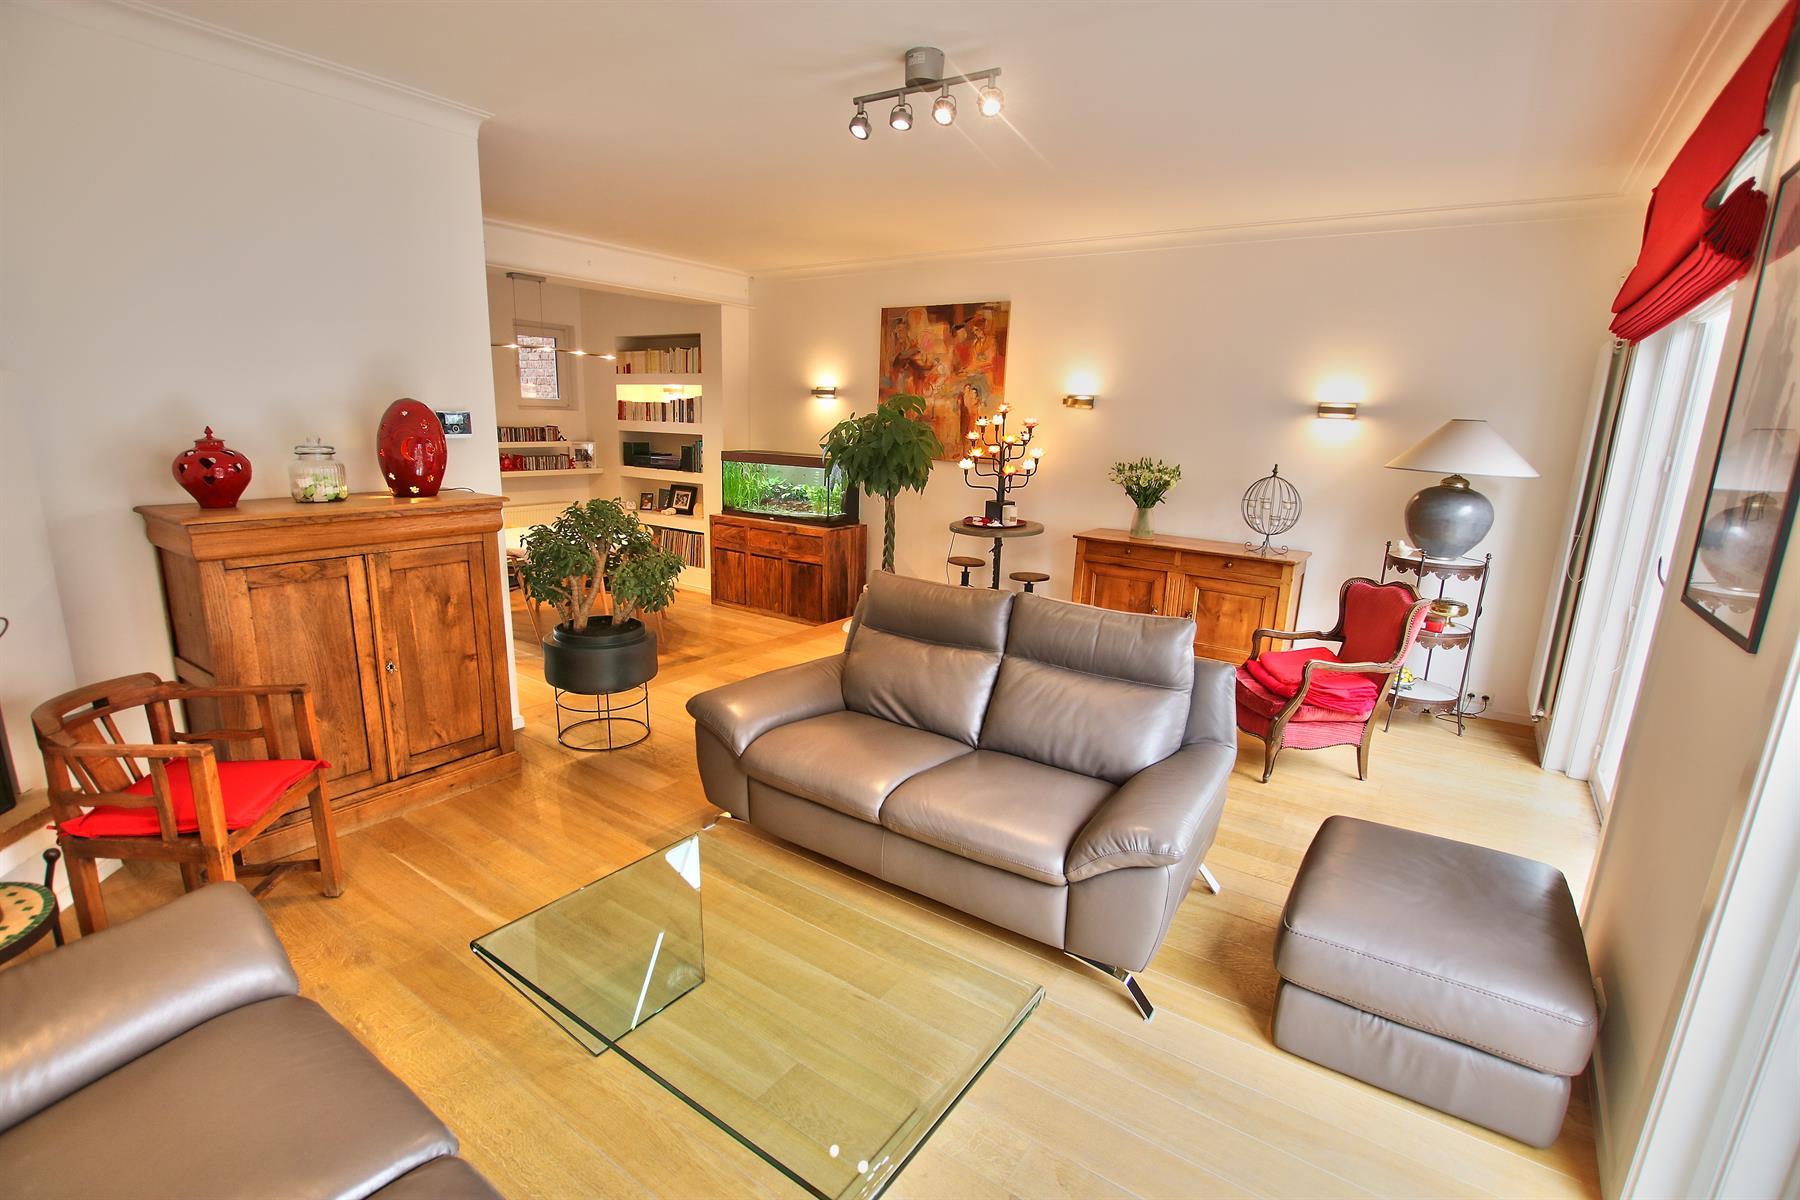 Maison - Etterbeek - #4454540-4